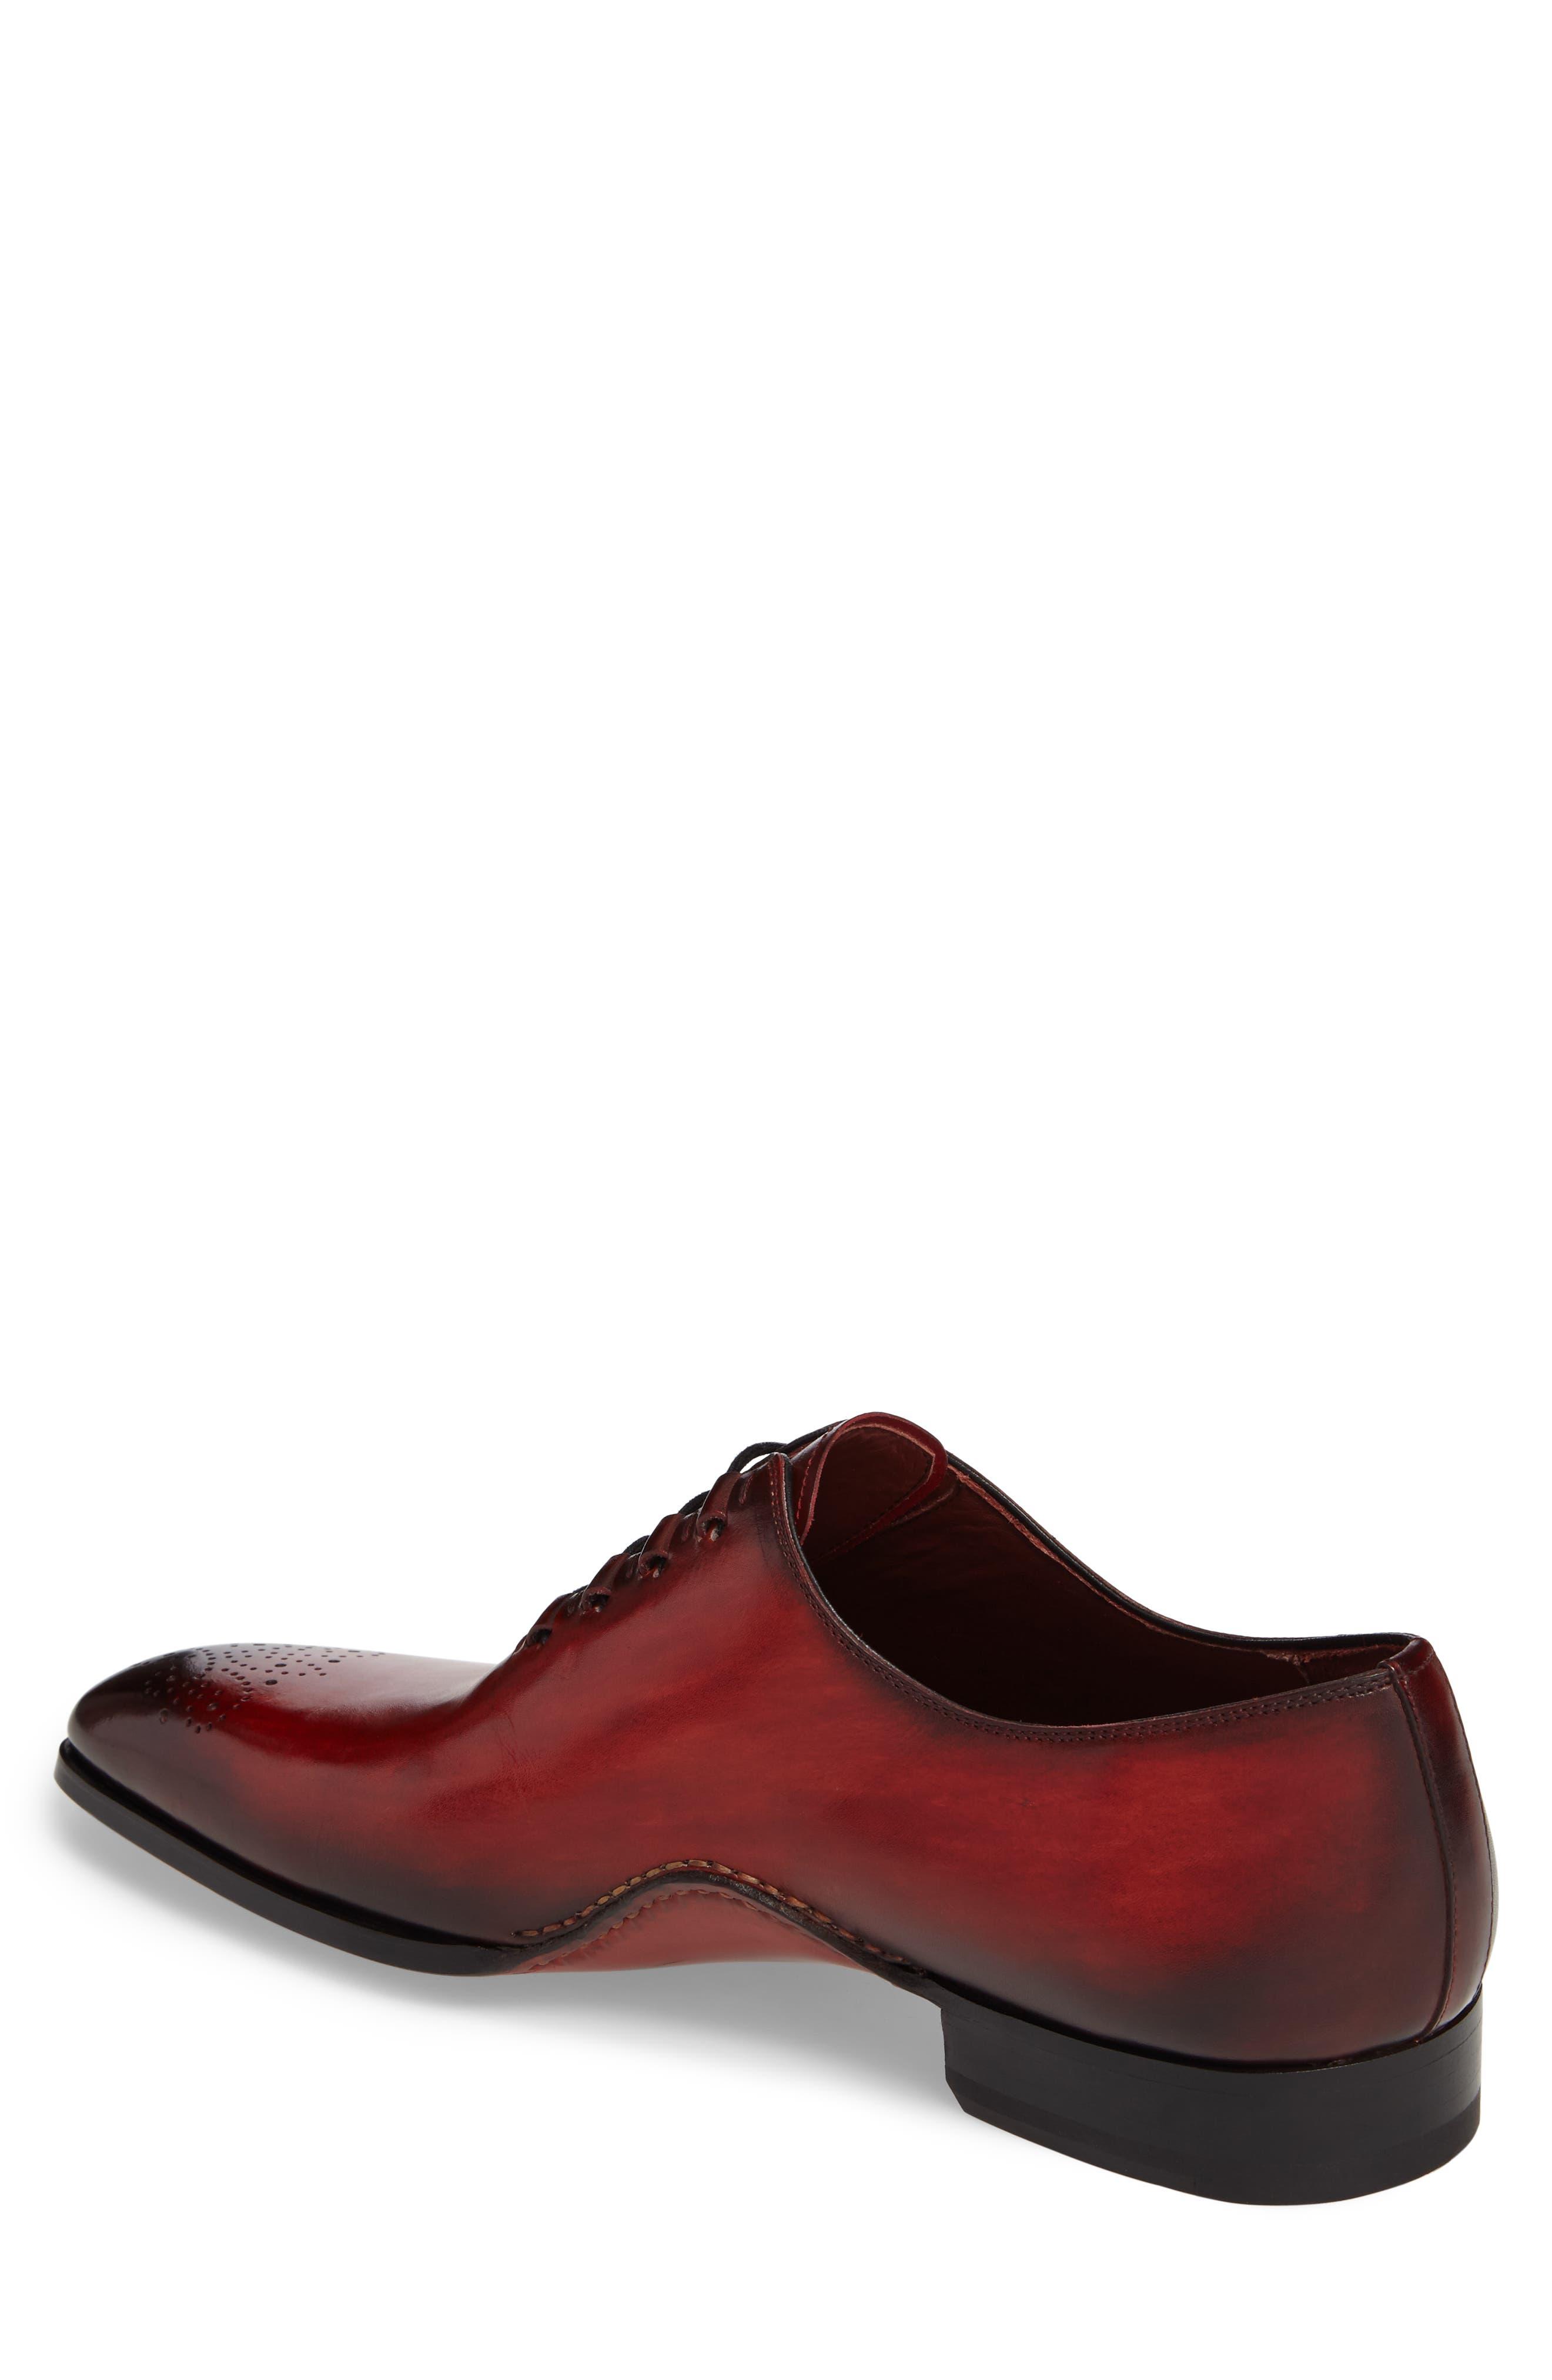 Josue Wholecut Oxford,                             Alternate thumbnail 2, color,                             Red Leather